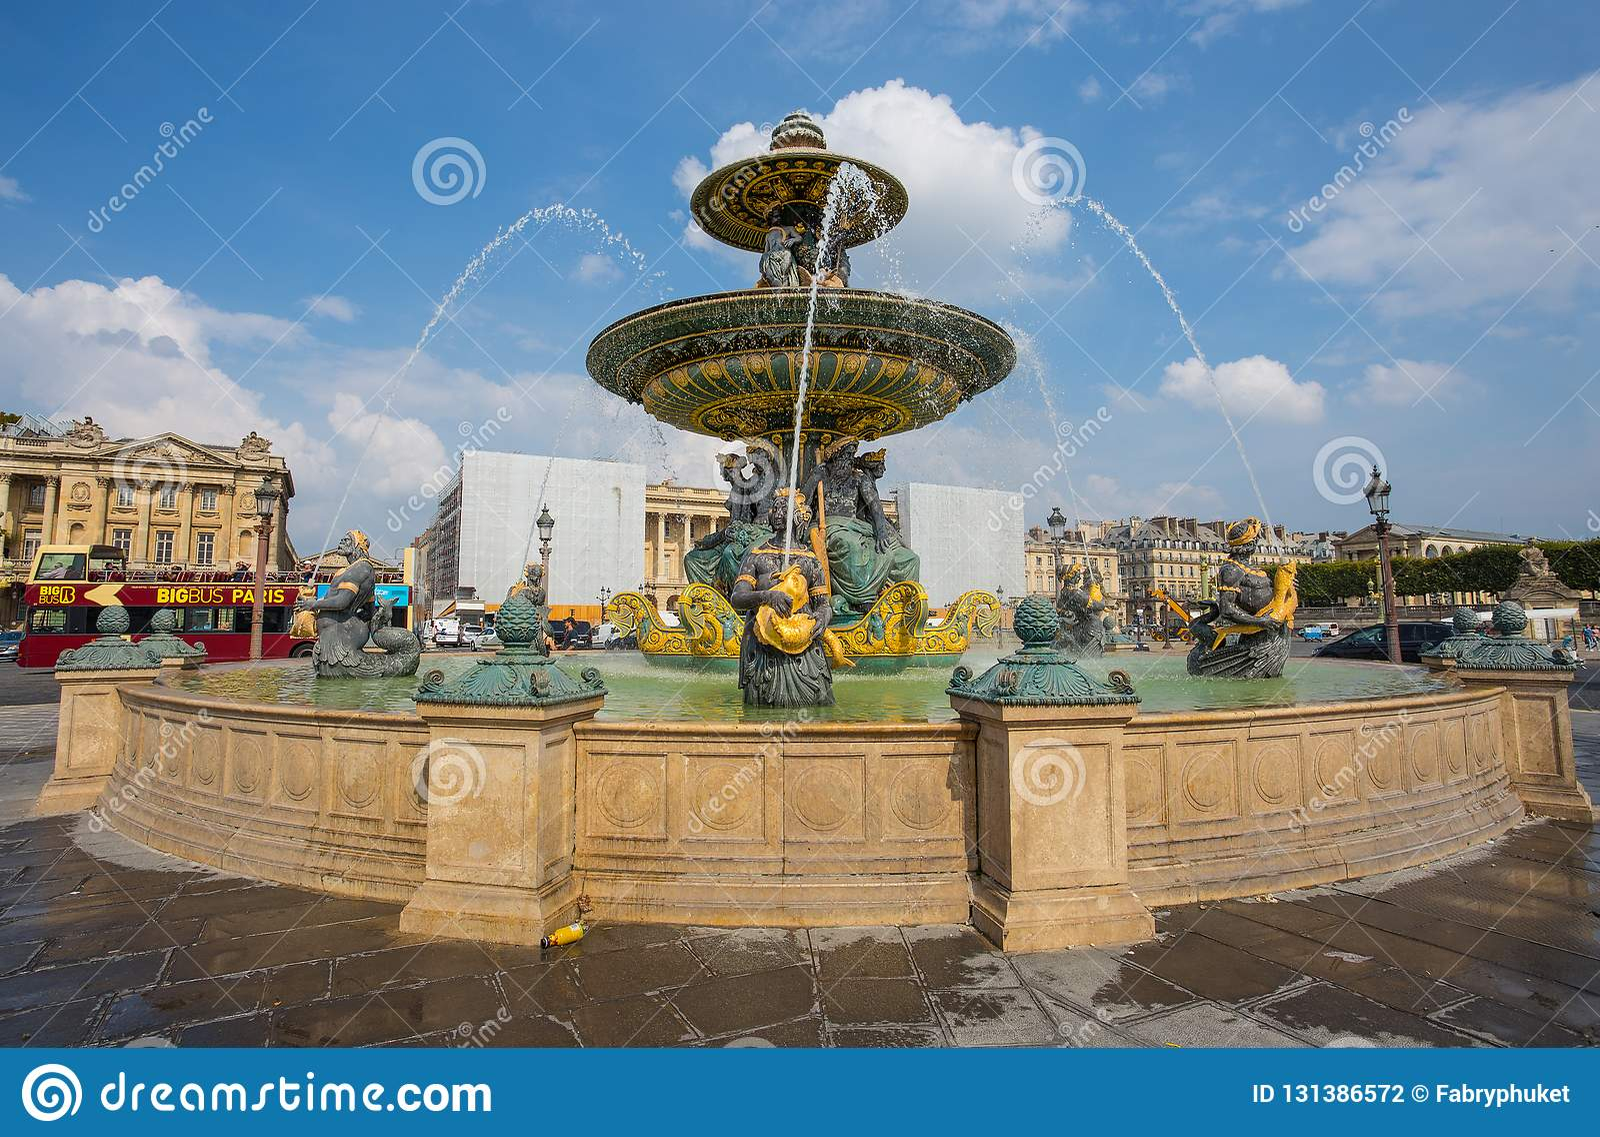 Plaza De La Concordia the fountain of the seas at place de la concorde in paris